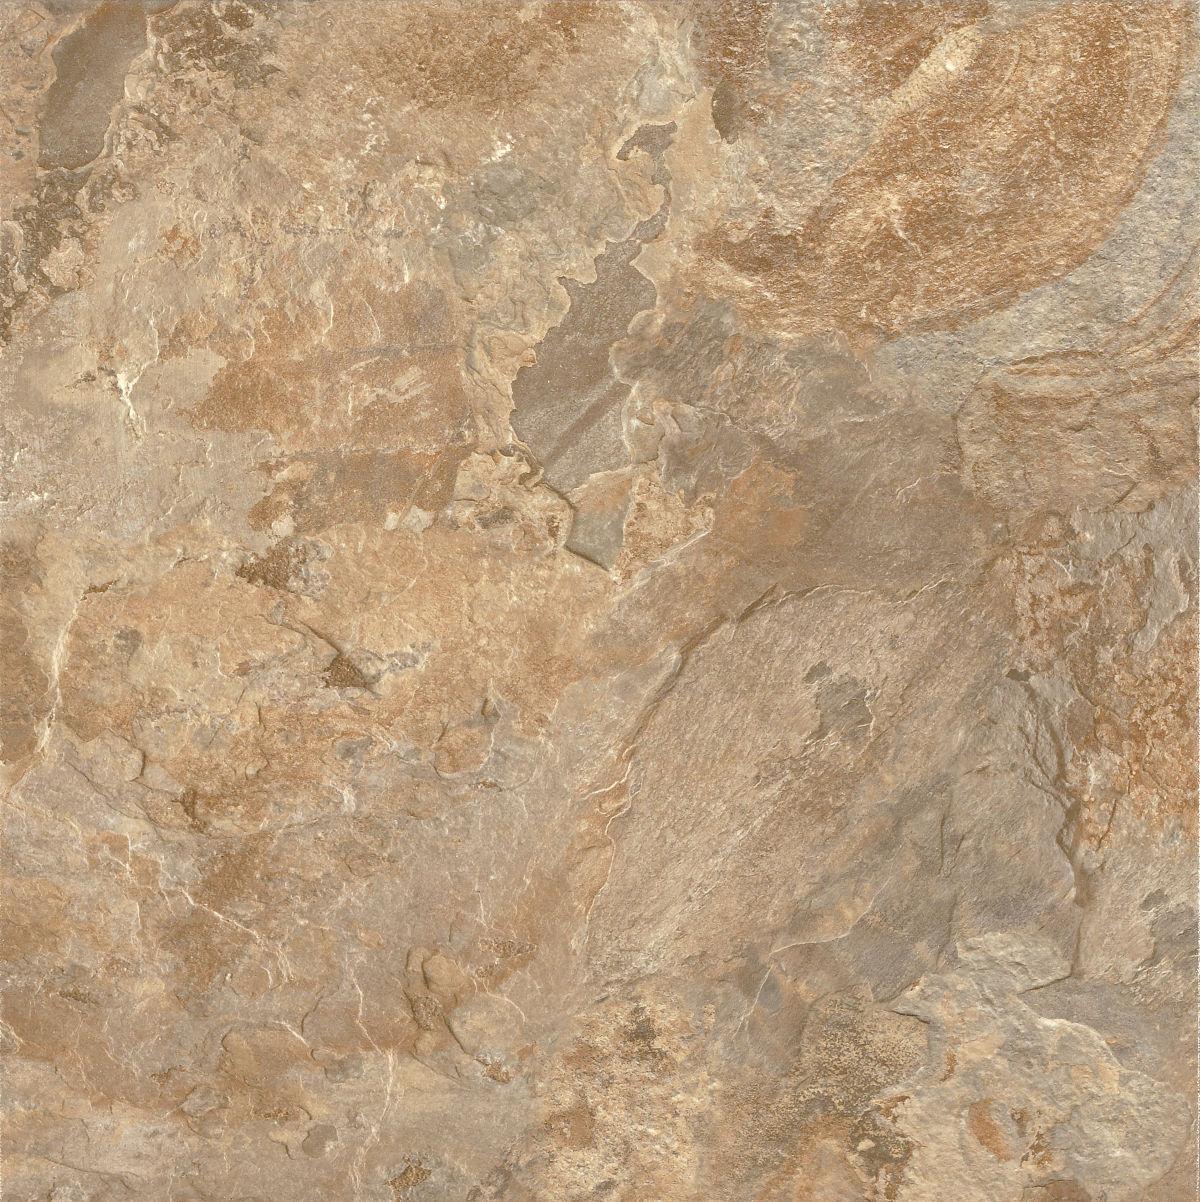 Terracotta/Clay